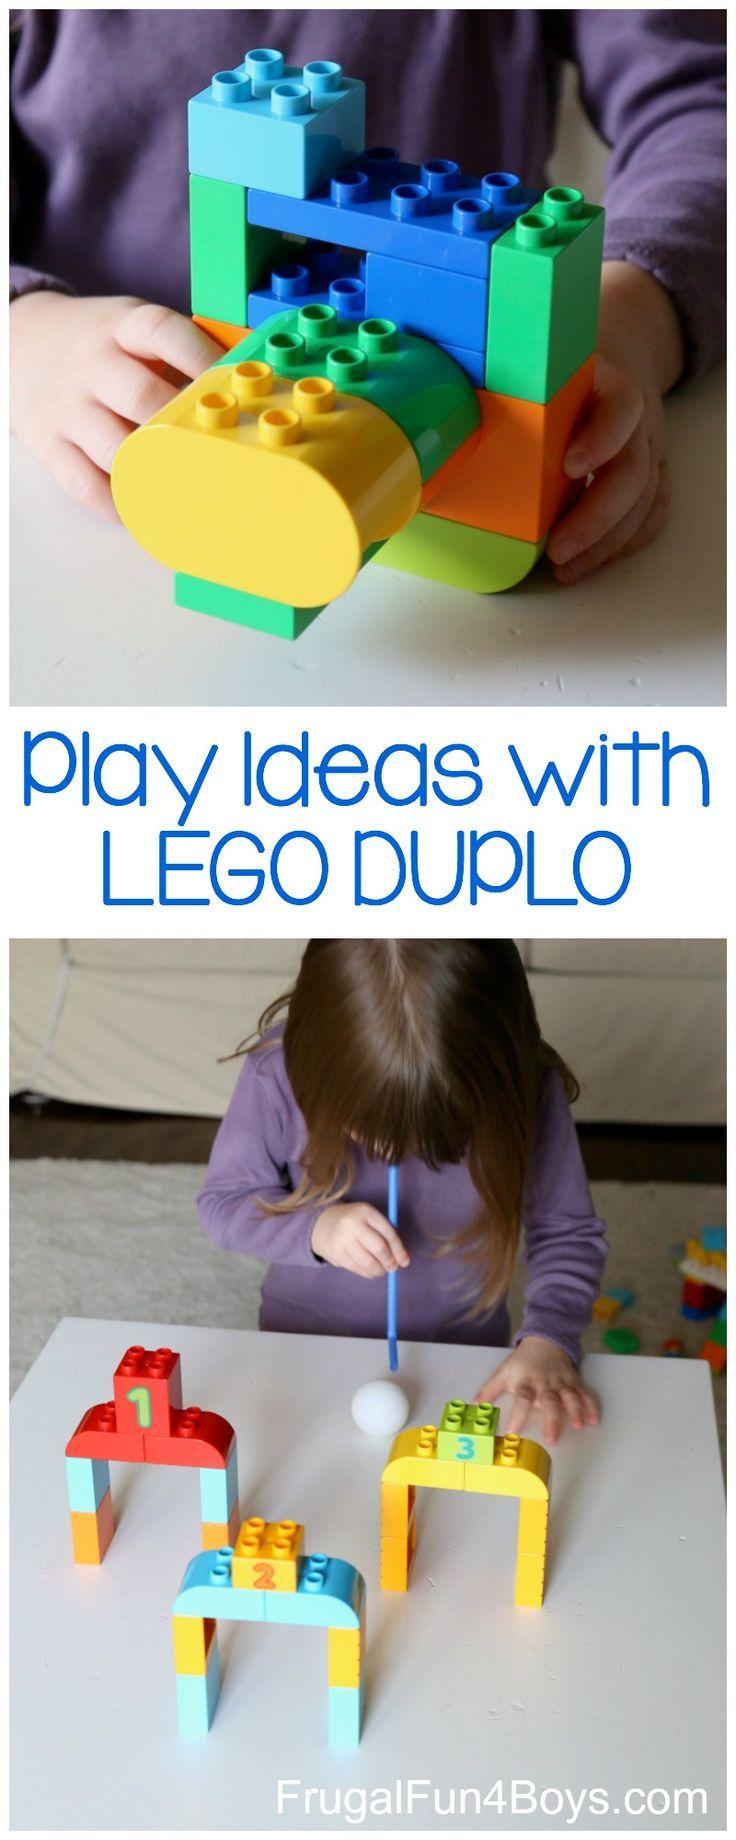 Play ideas for preschoolers with LEGO DUPLO bricks